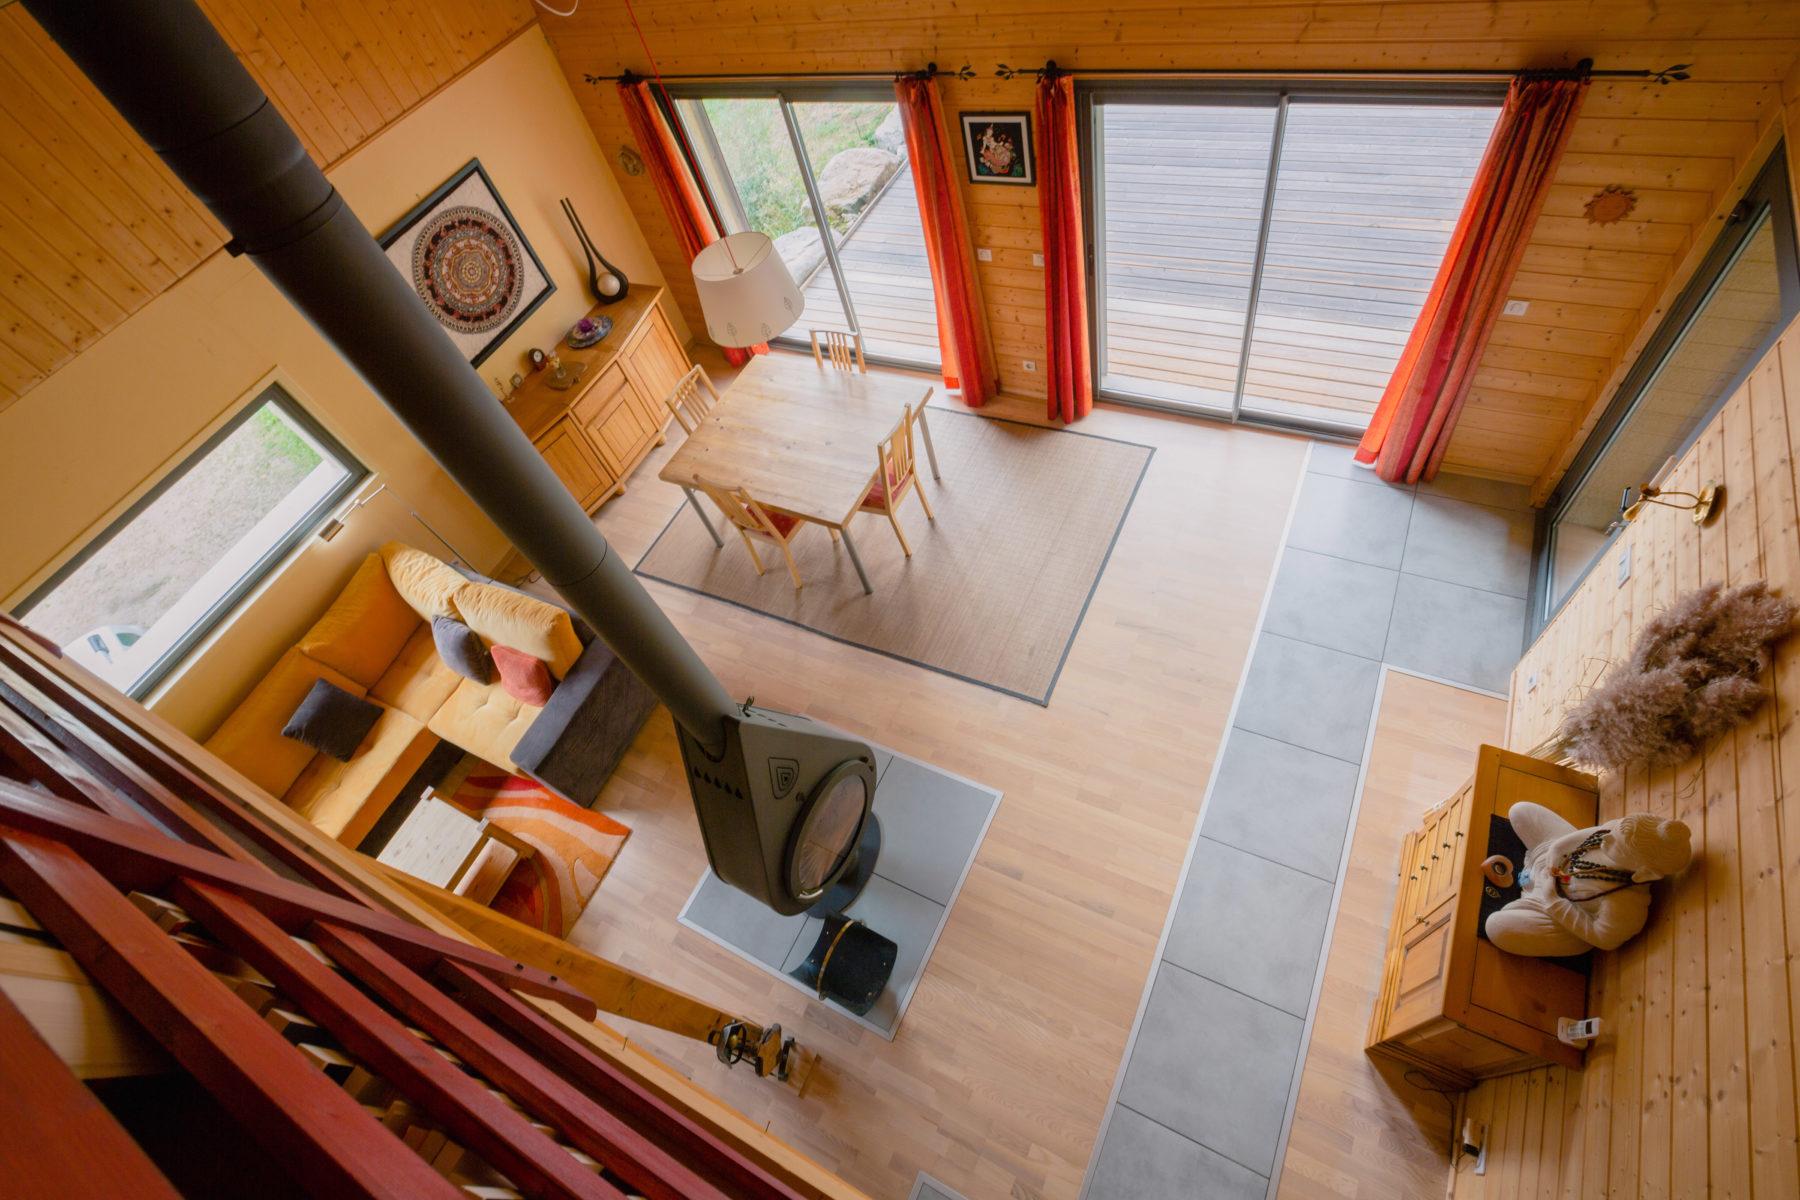 photographe immobilier lyon perspective